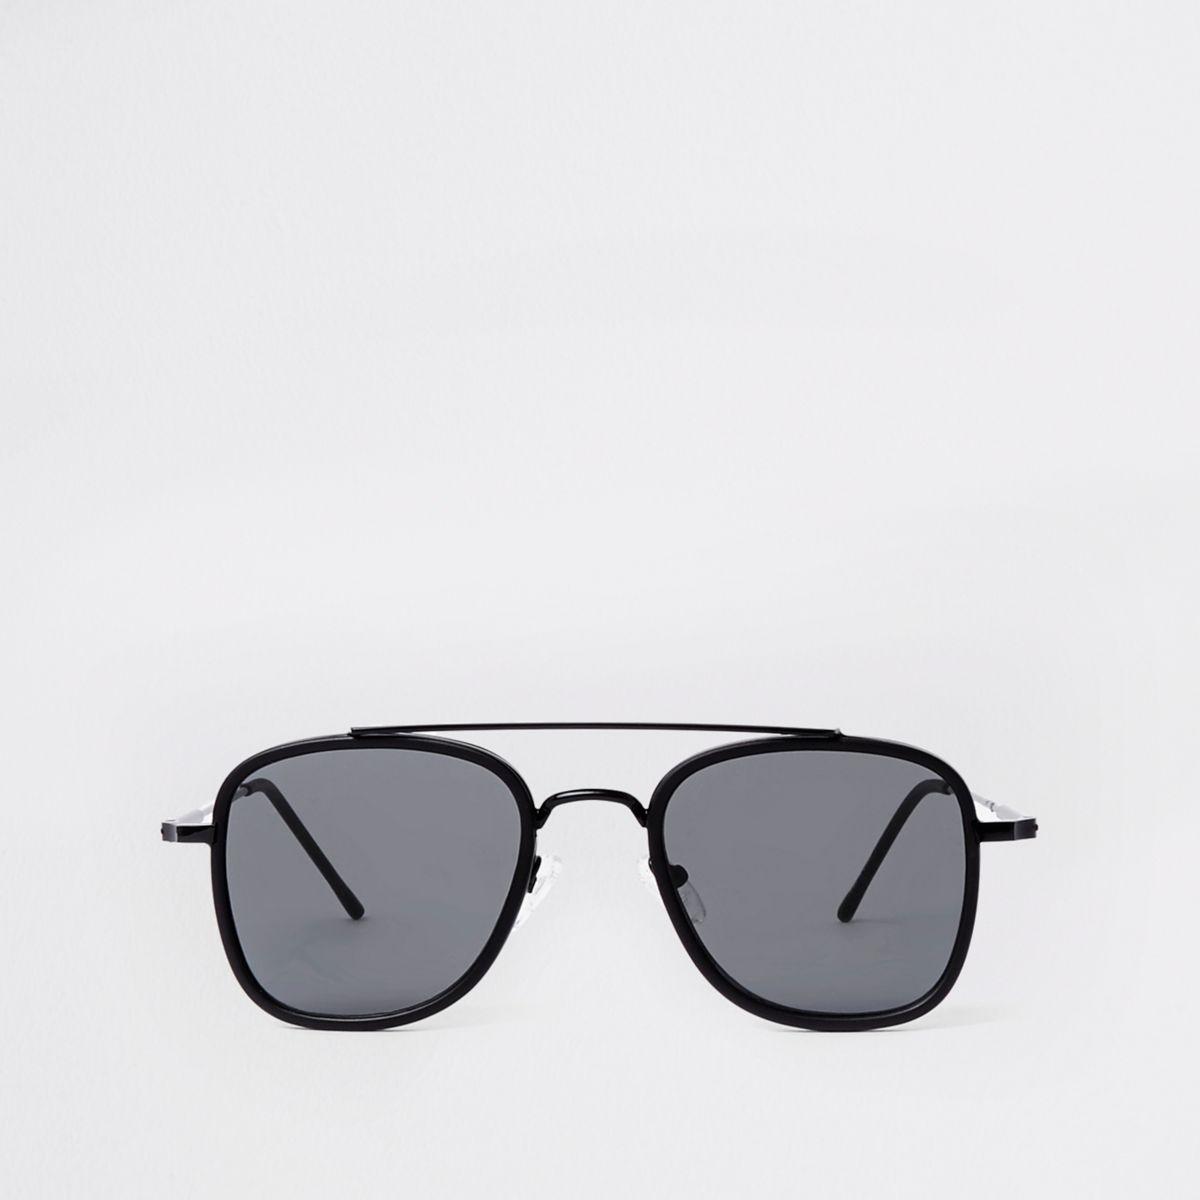 Black square brow aviator sunglasses